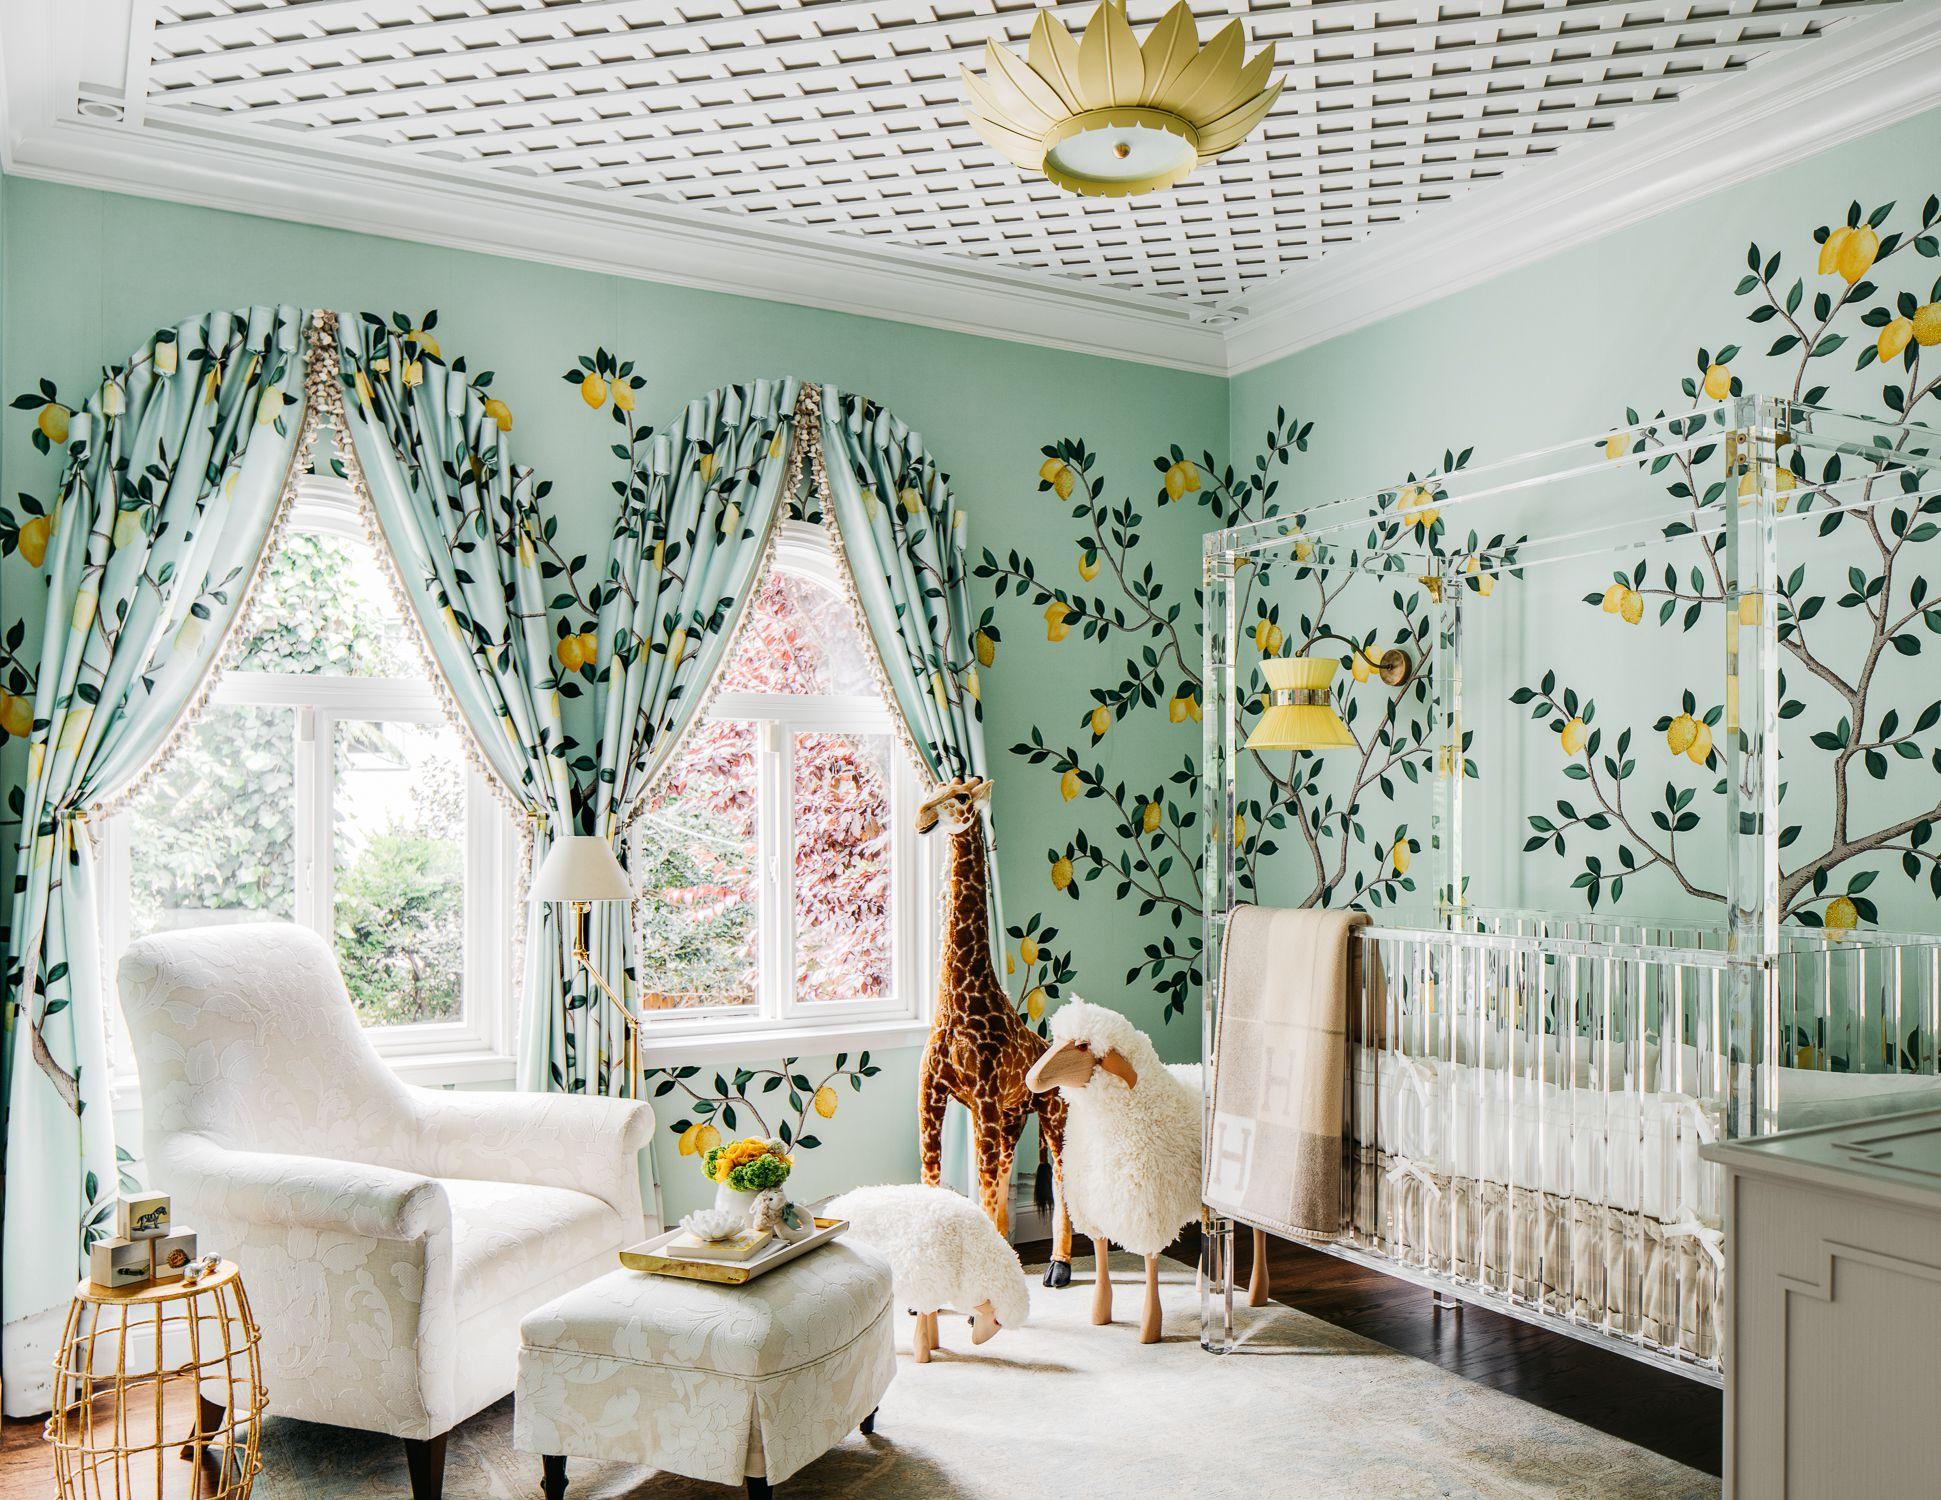 How Designer Dina Bandman Turned a Bland Nursery Into An Italian Escape